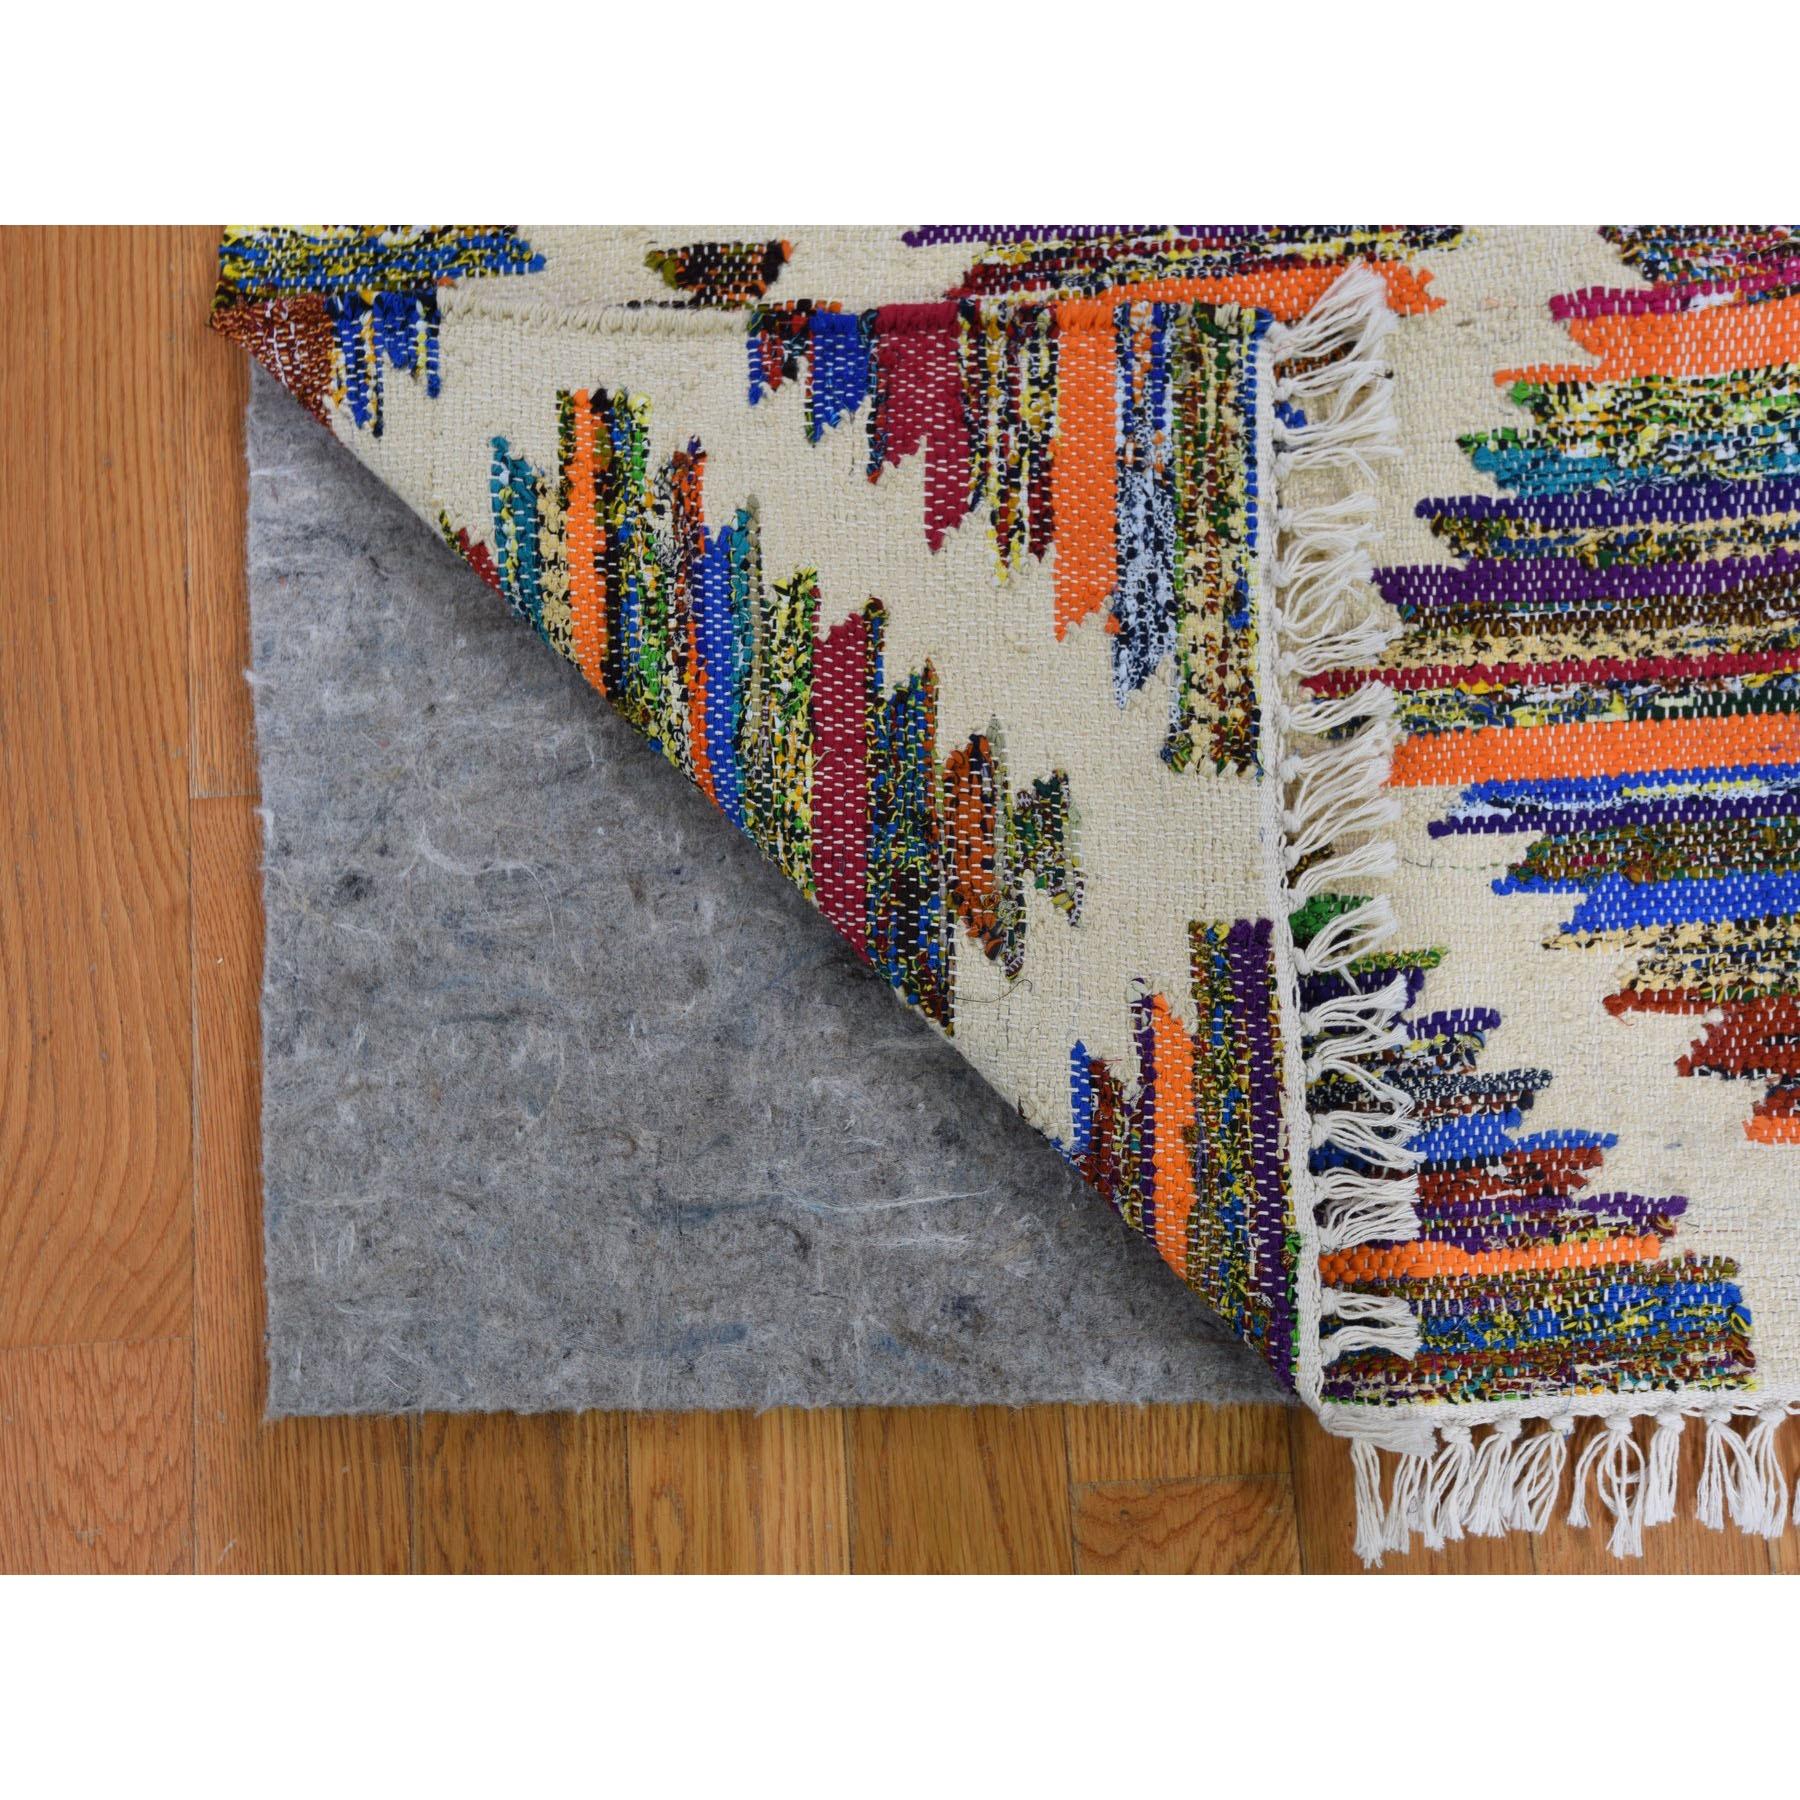 "2'7""x8' Colorful Cotton and Sari Silk Geometric Design Kilim Runner Oriental Rug"